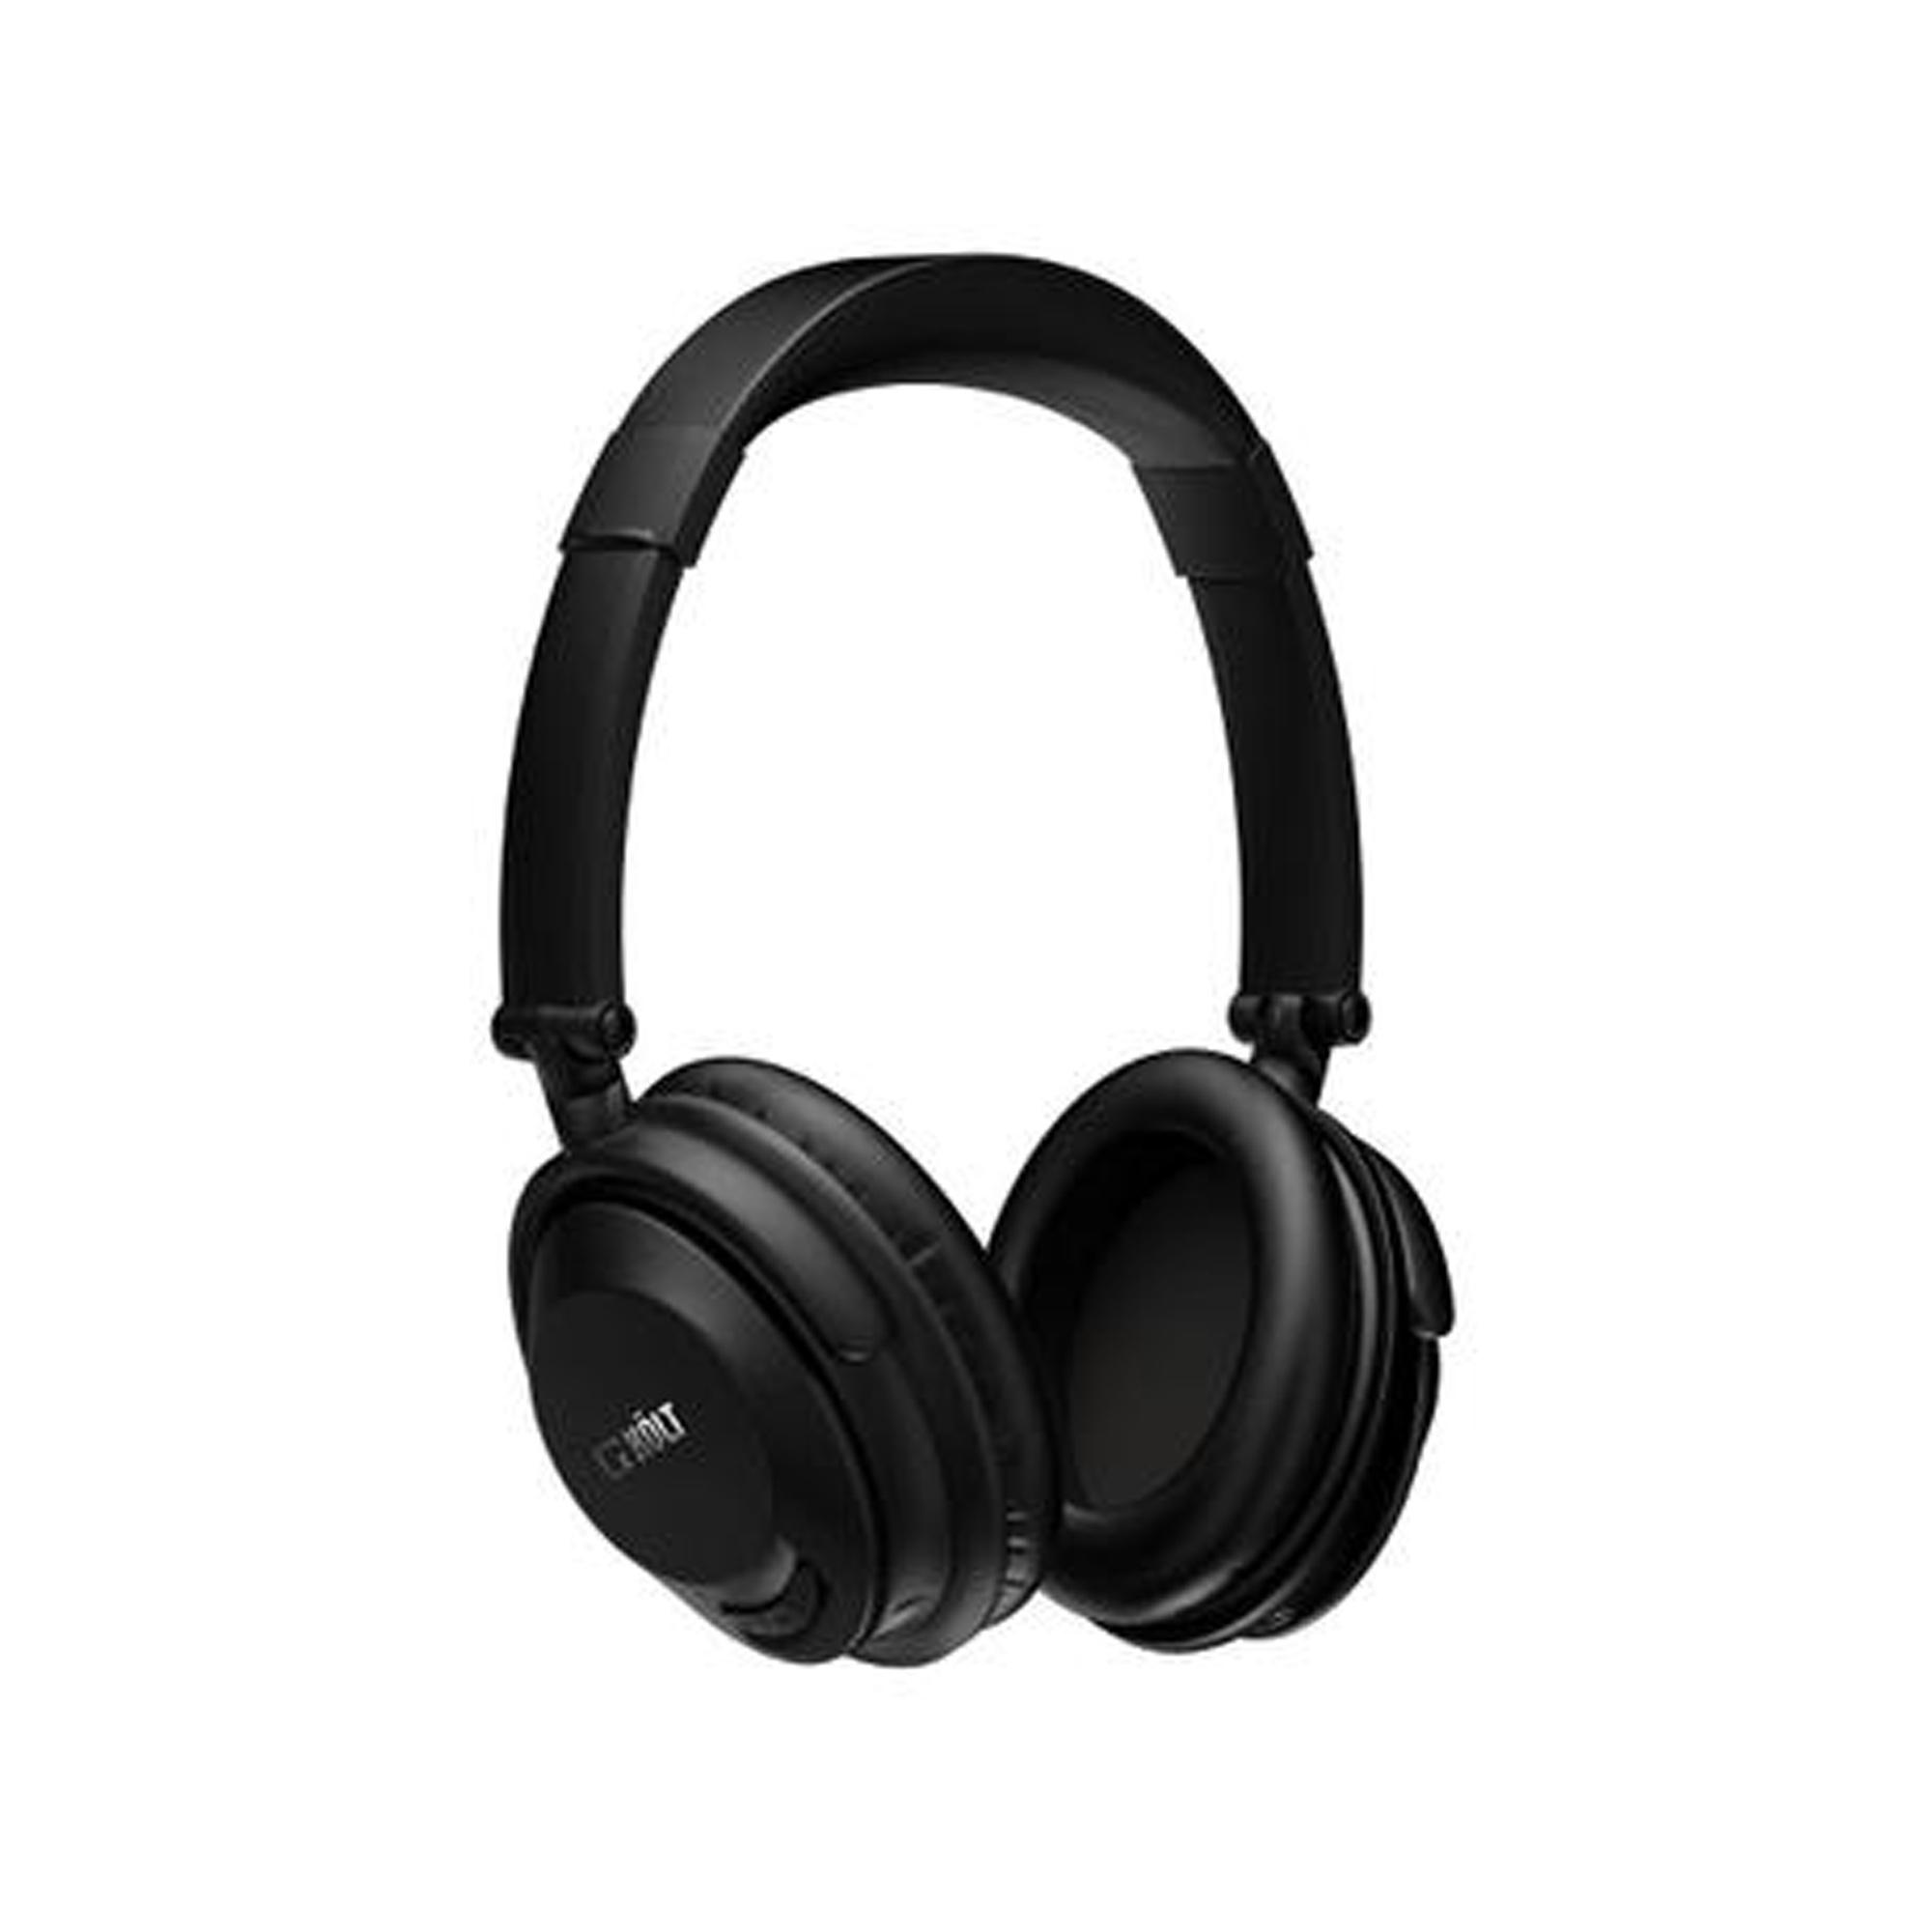 Fone de Ouvido Kolt K-740NC Bluetooth